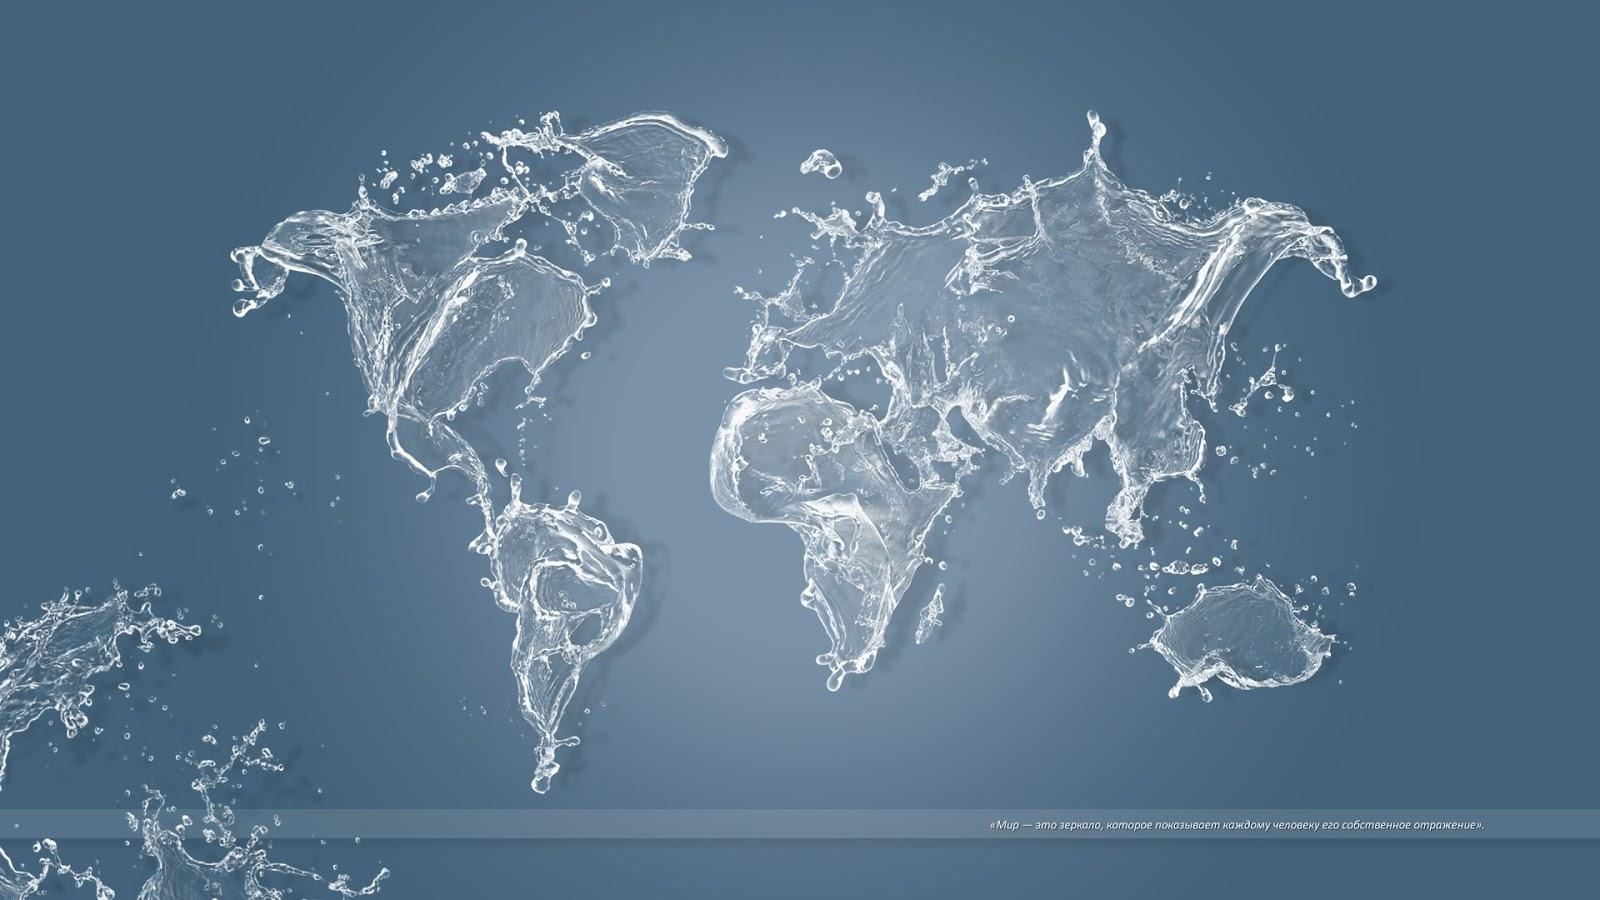 15 world map wallpaper - photo #18